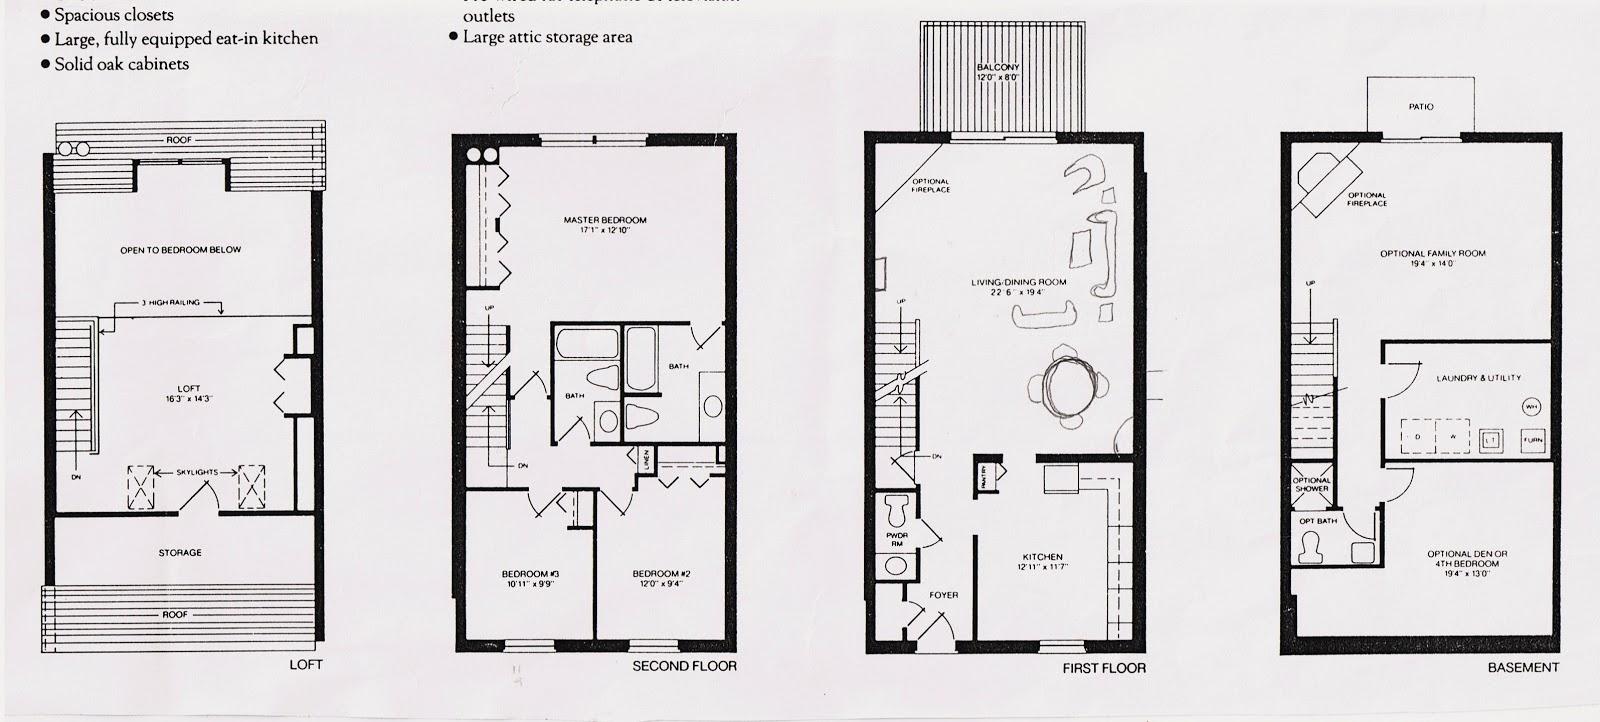 Bathroom Floor Plans For 7 X 10